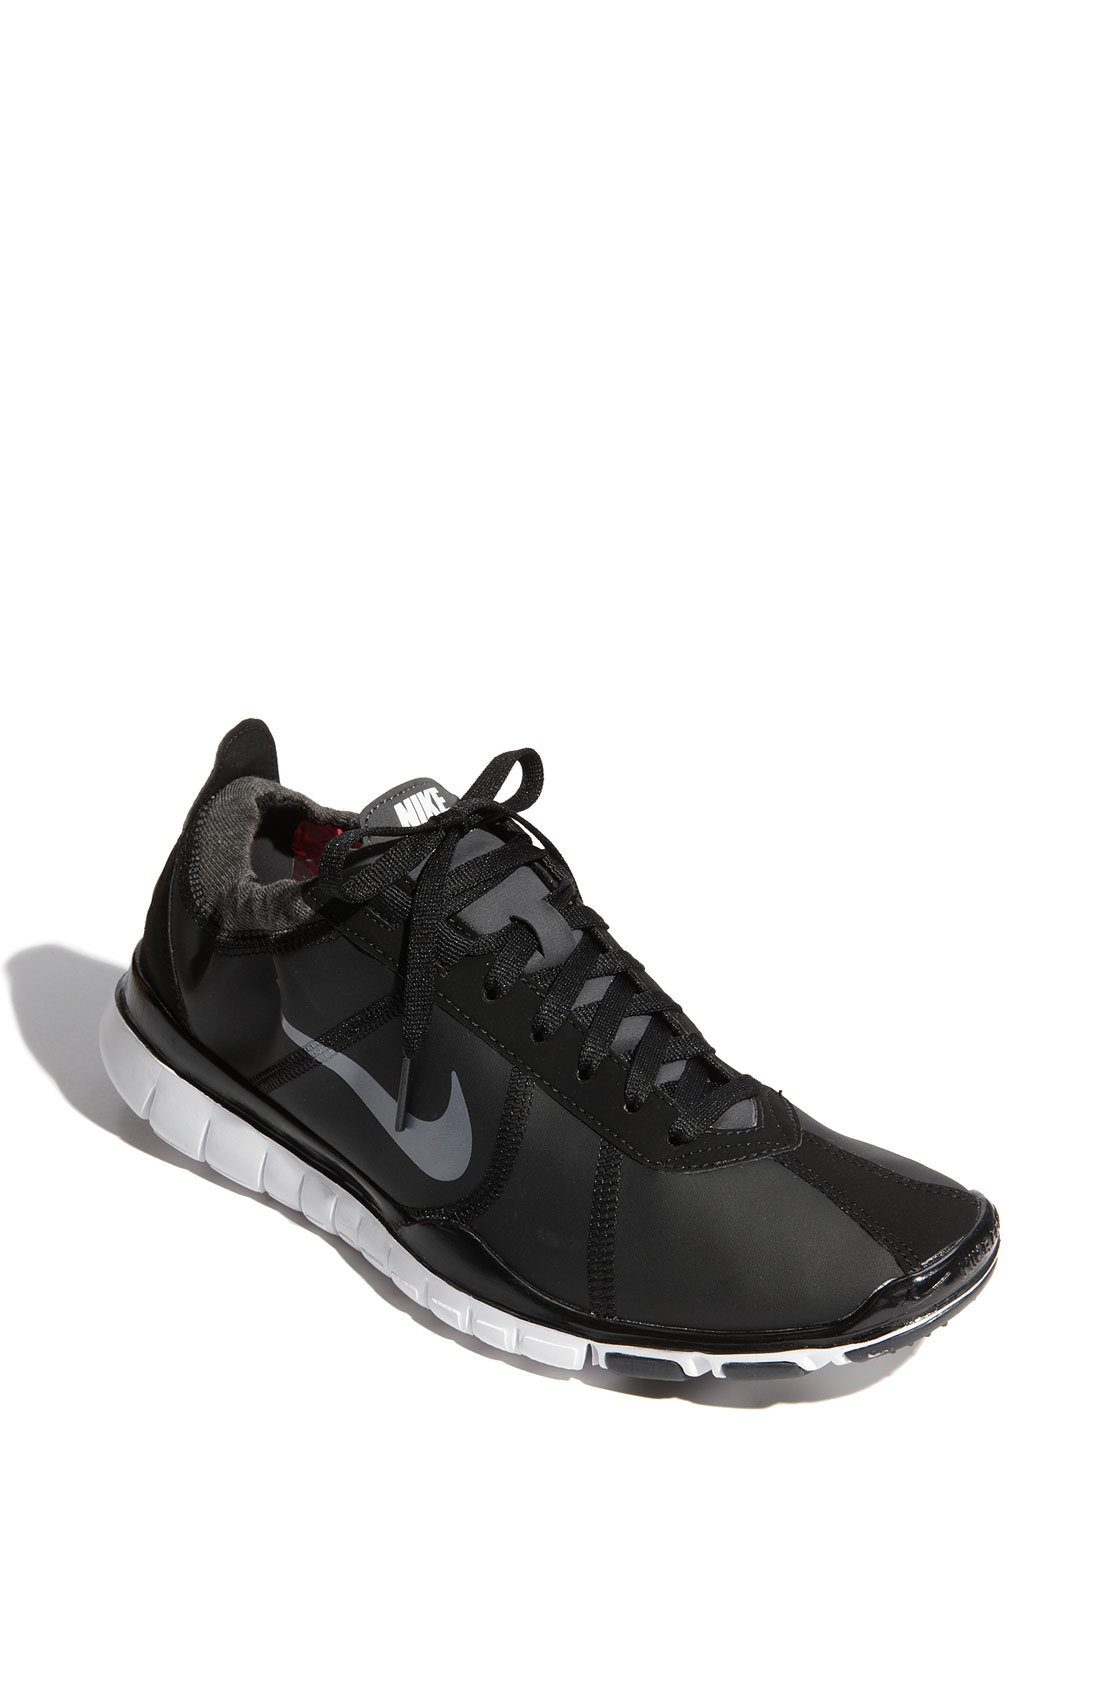 Nike Free Twist Training Shoe in Black (black/ cool grey)   Lyst